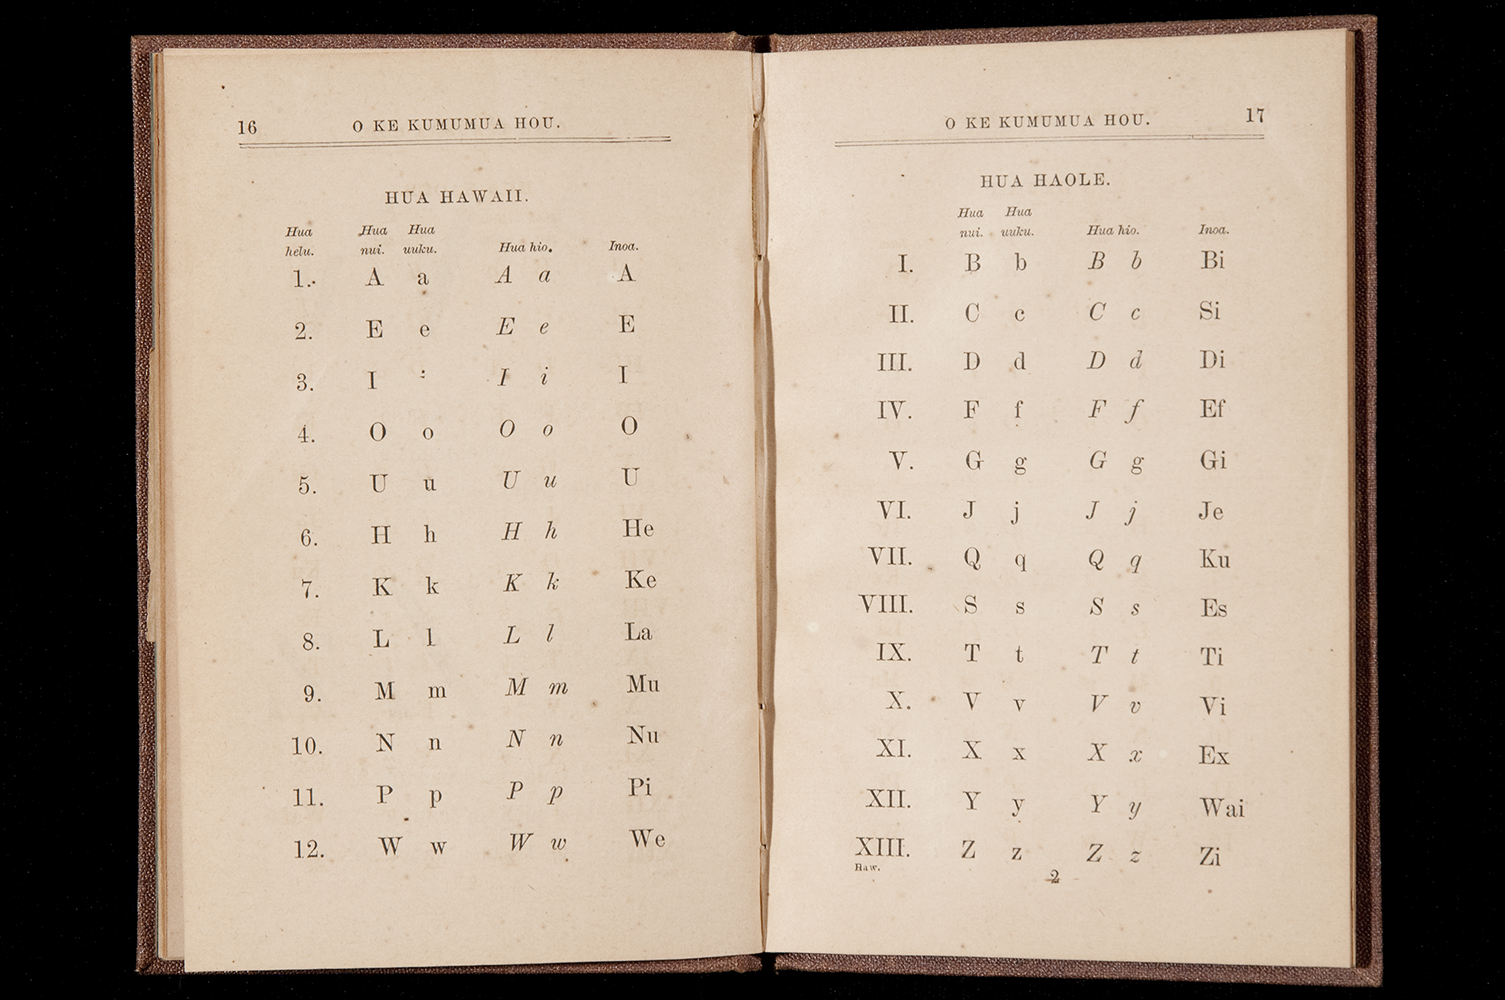 [O ke Kumumua Hou] Hawaiian language primer. Photo by David Franzen.